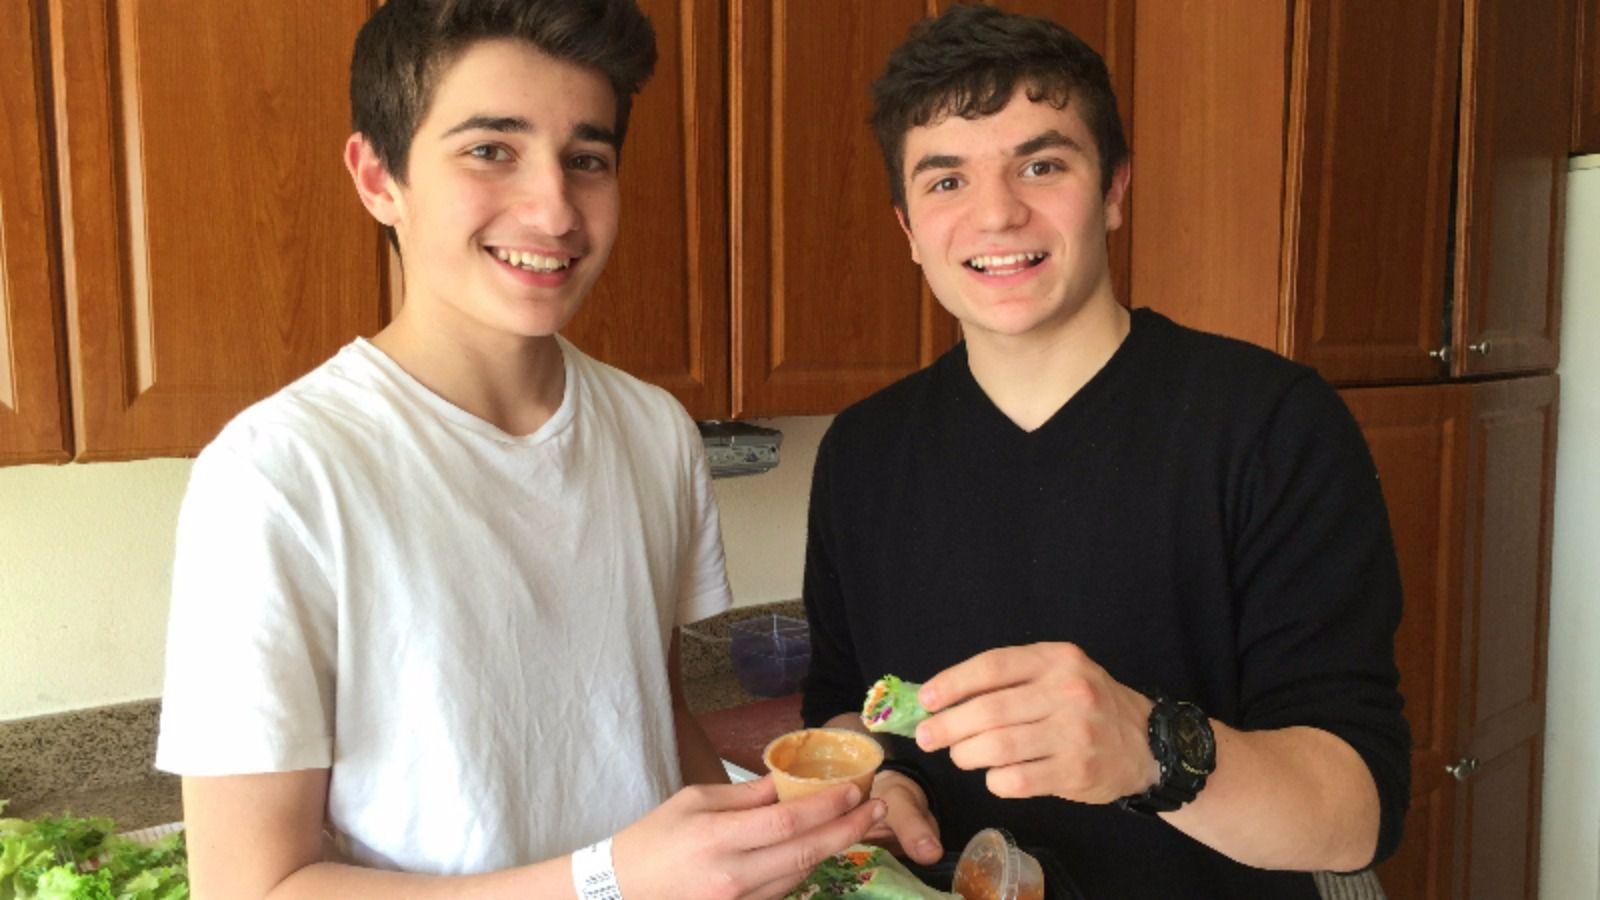 Brothers Gabriel (right) and Raphael Shpitalnik make their kosher Angel Rolls after school twice a week.